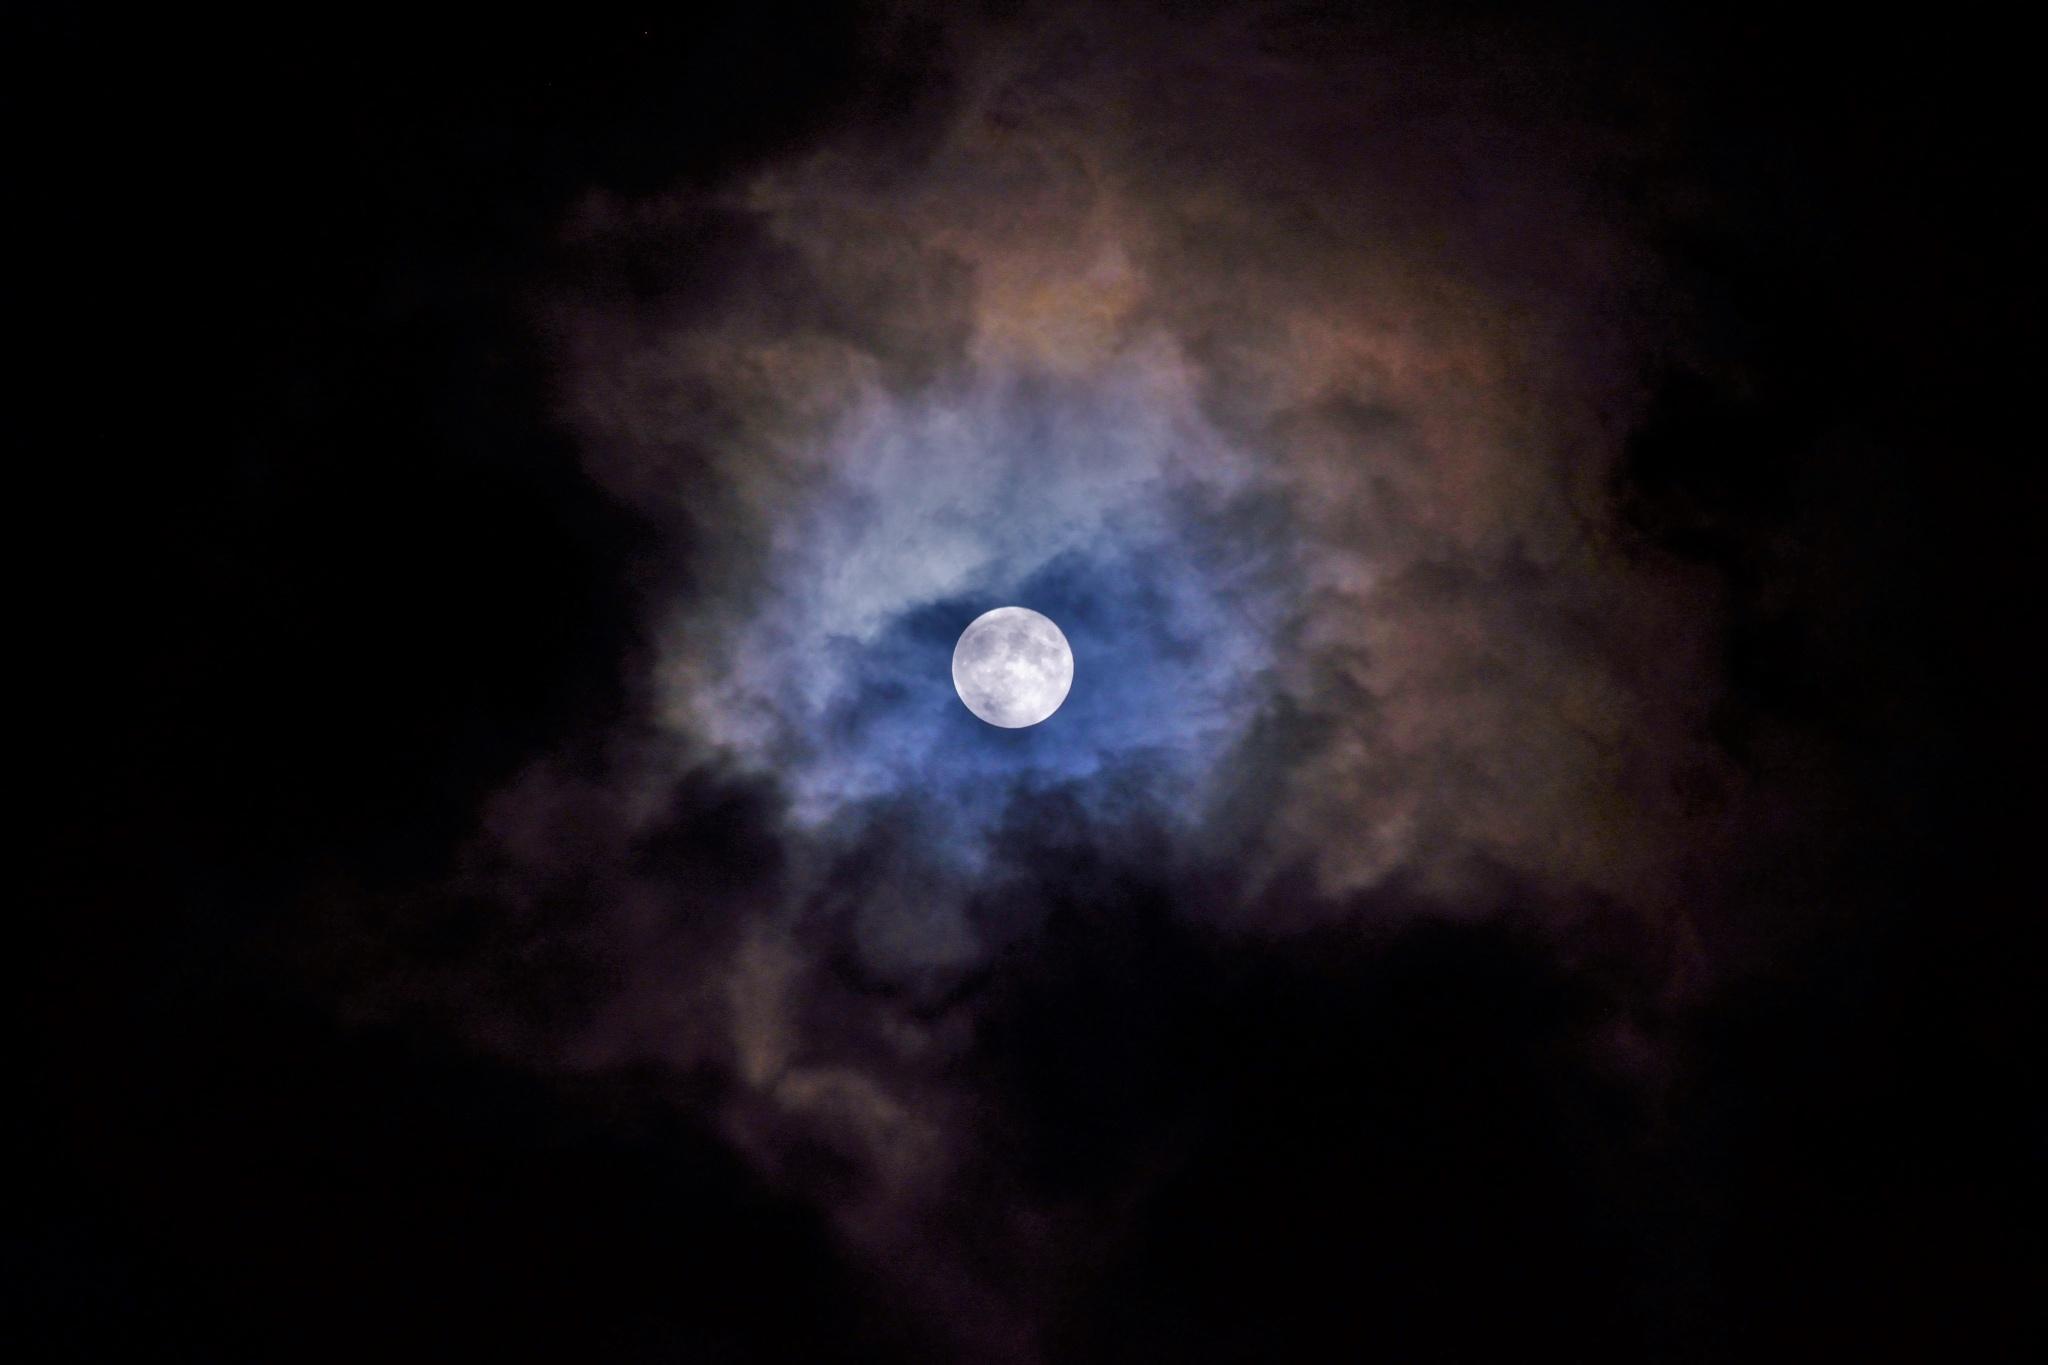 The Night by Pukshansky Gregory